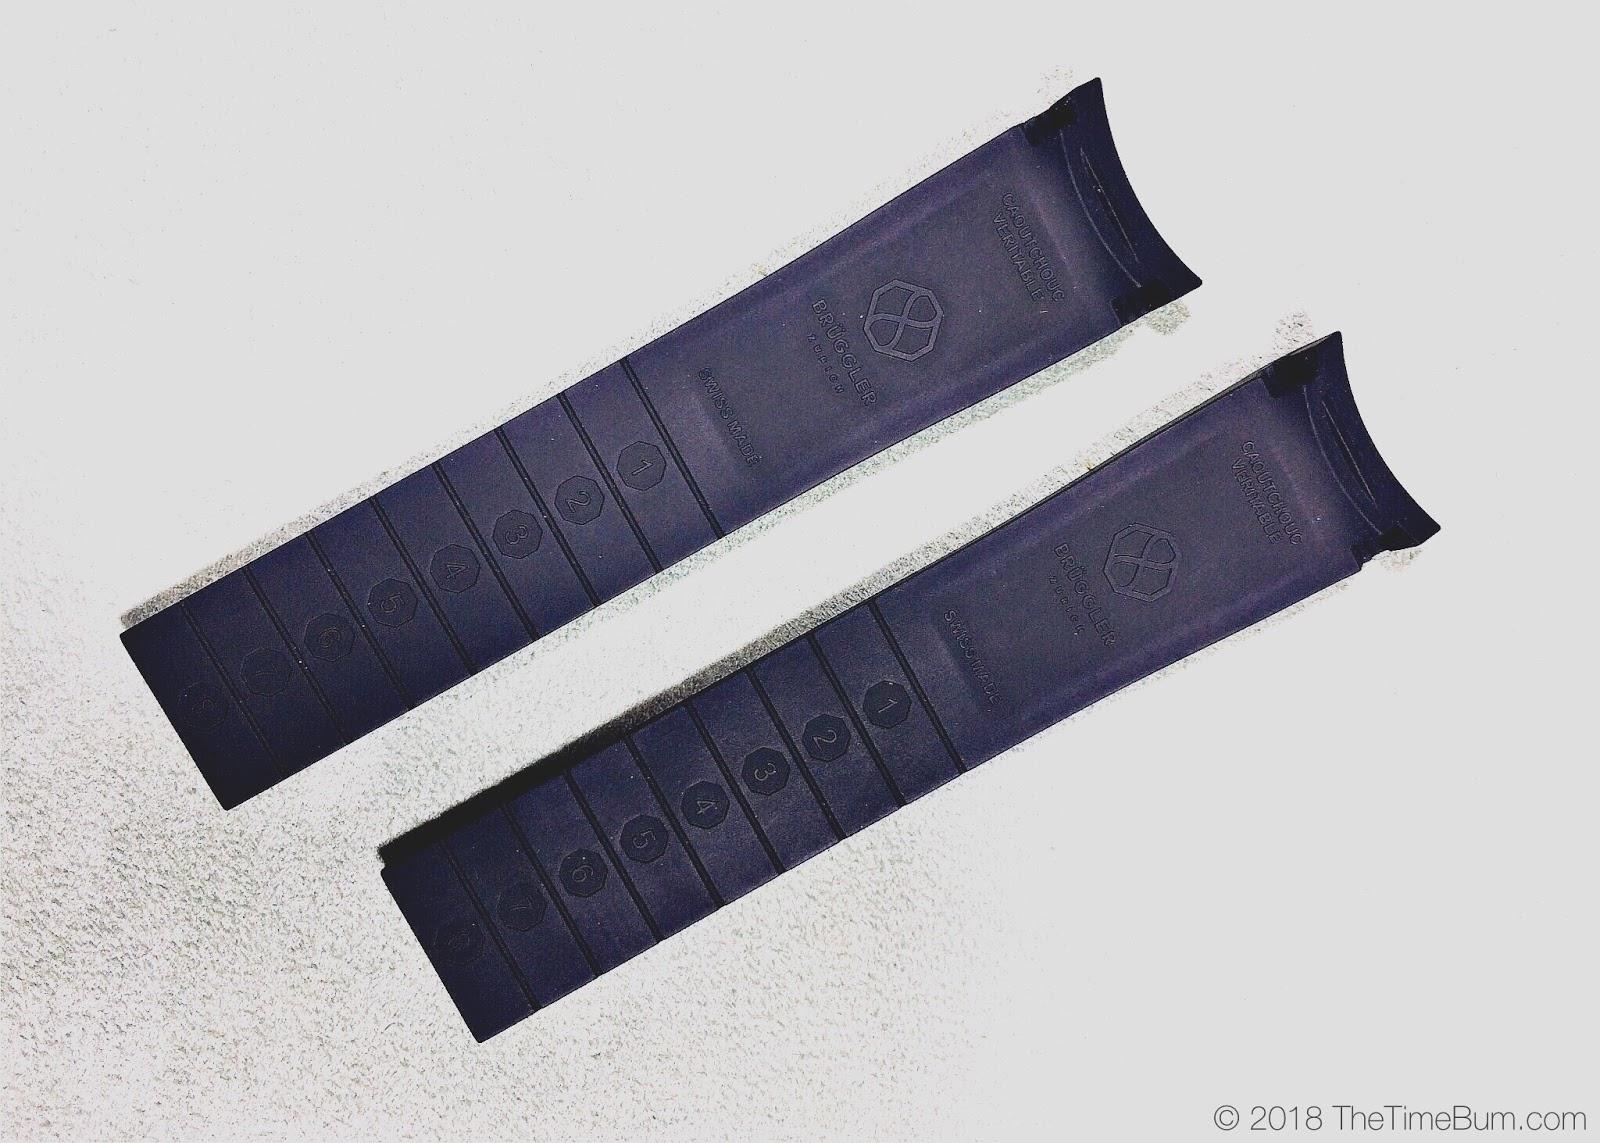 Bruggler Chronograph rubber strap